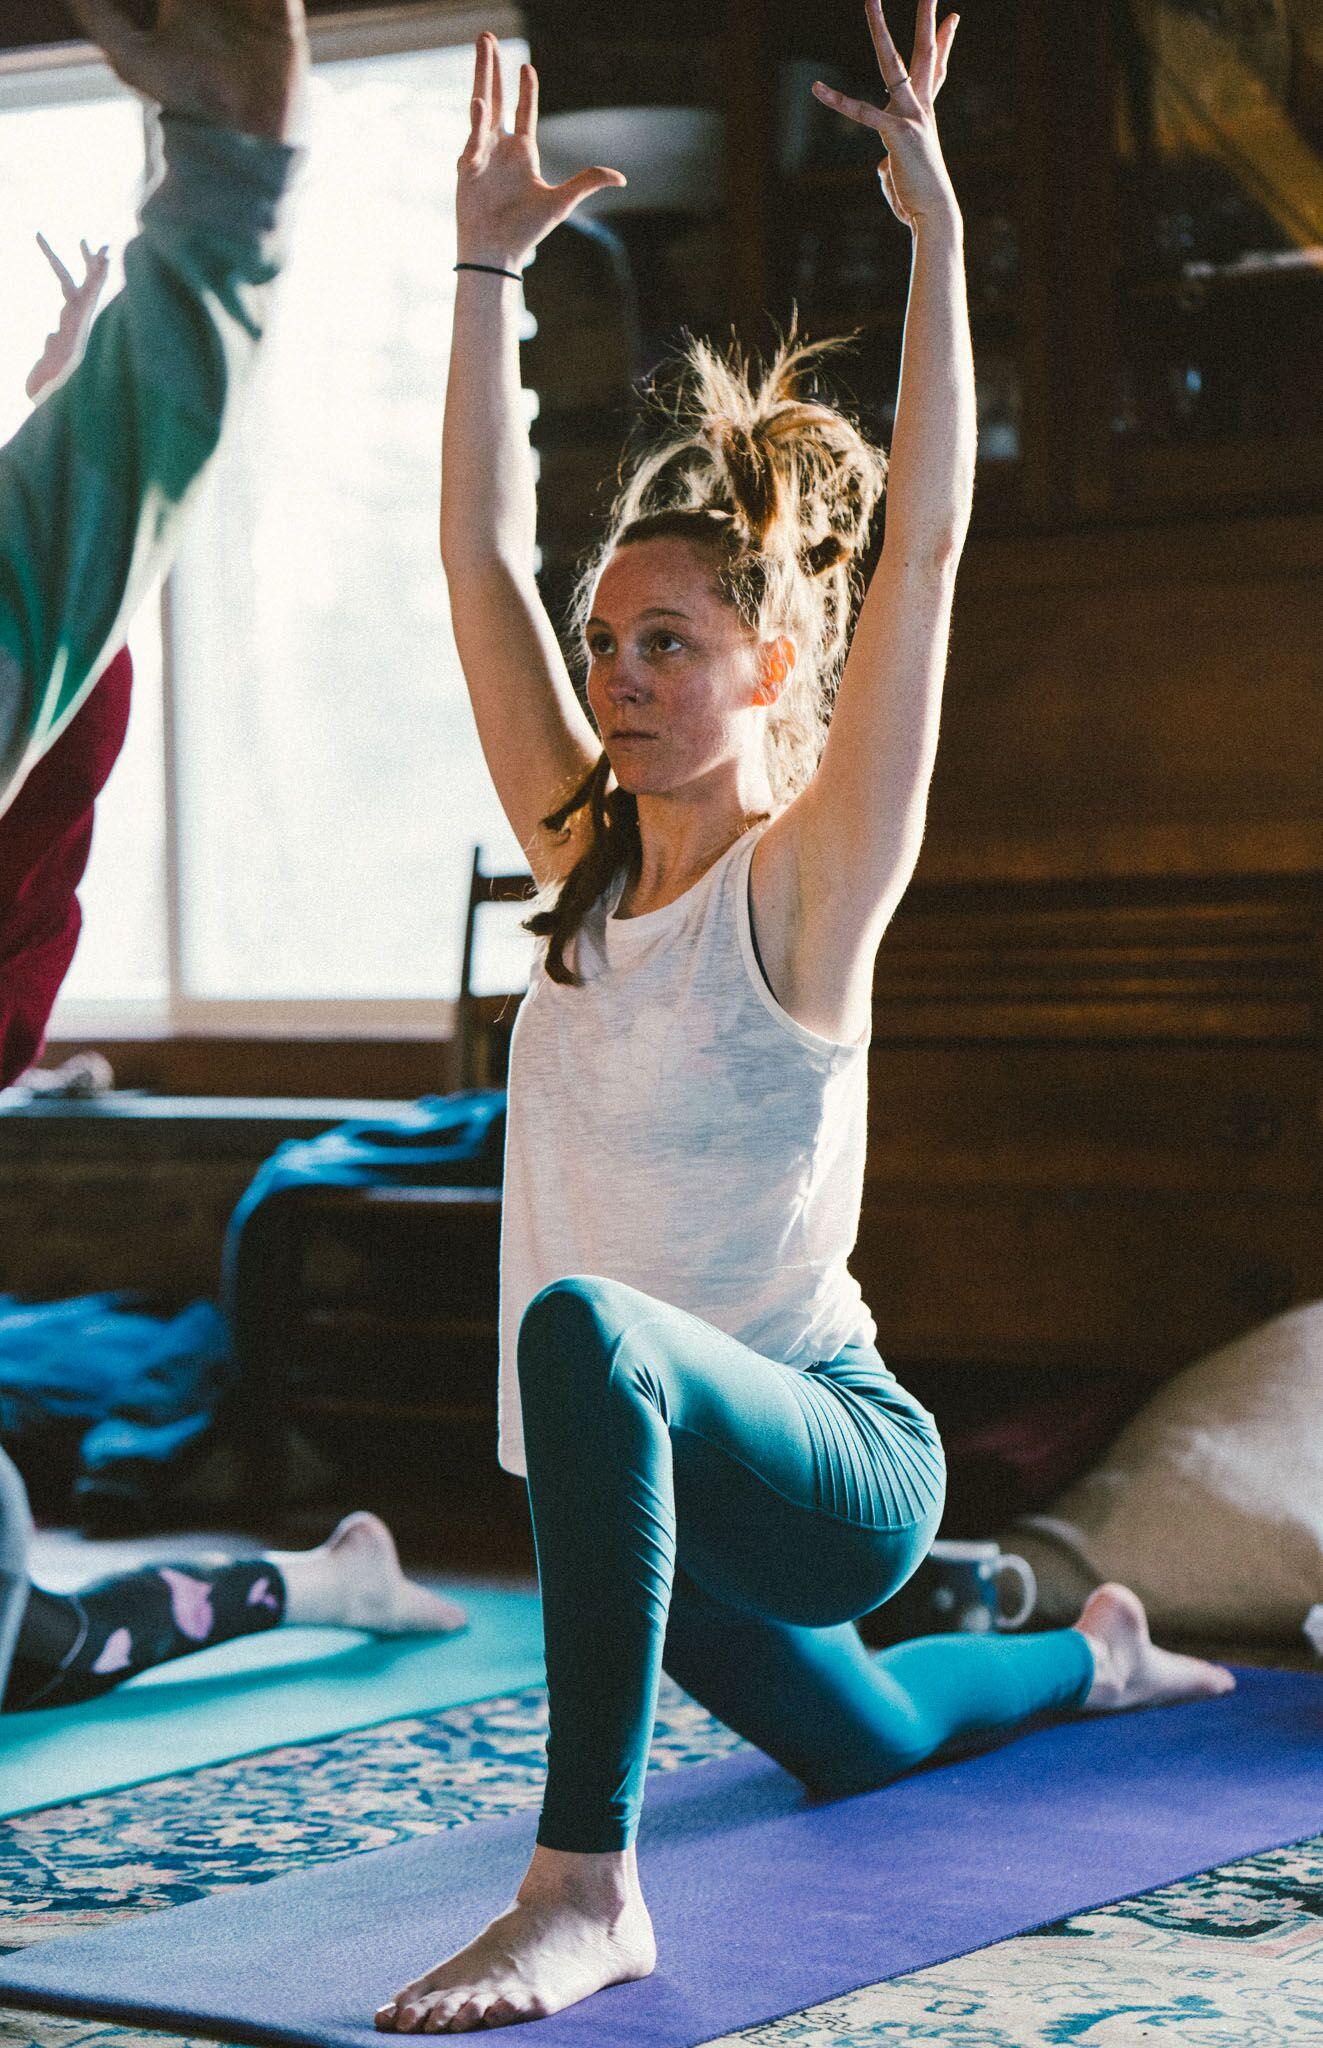 Chloe, Yoga Teacher in Training